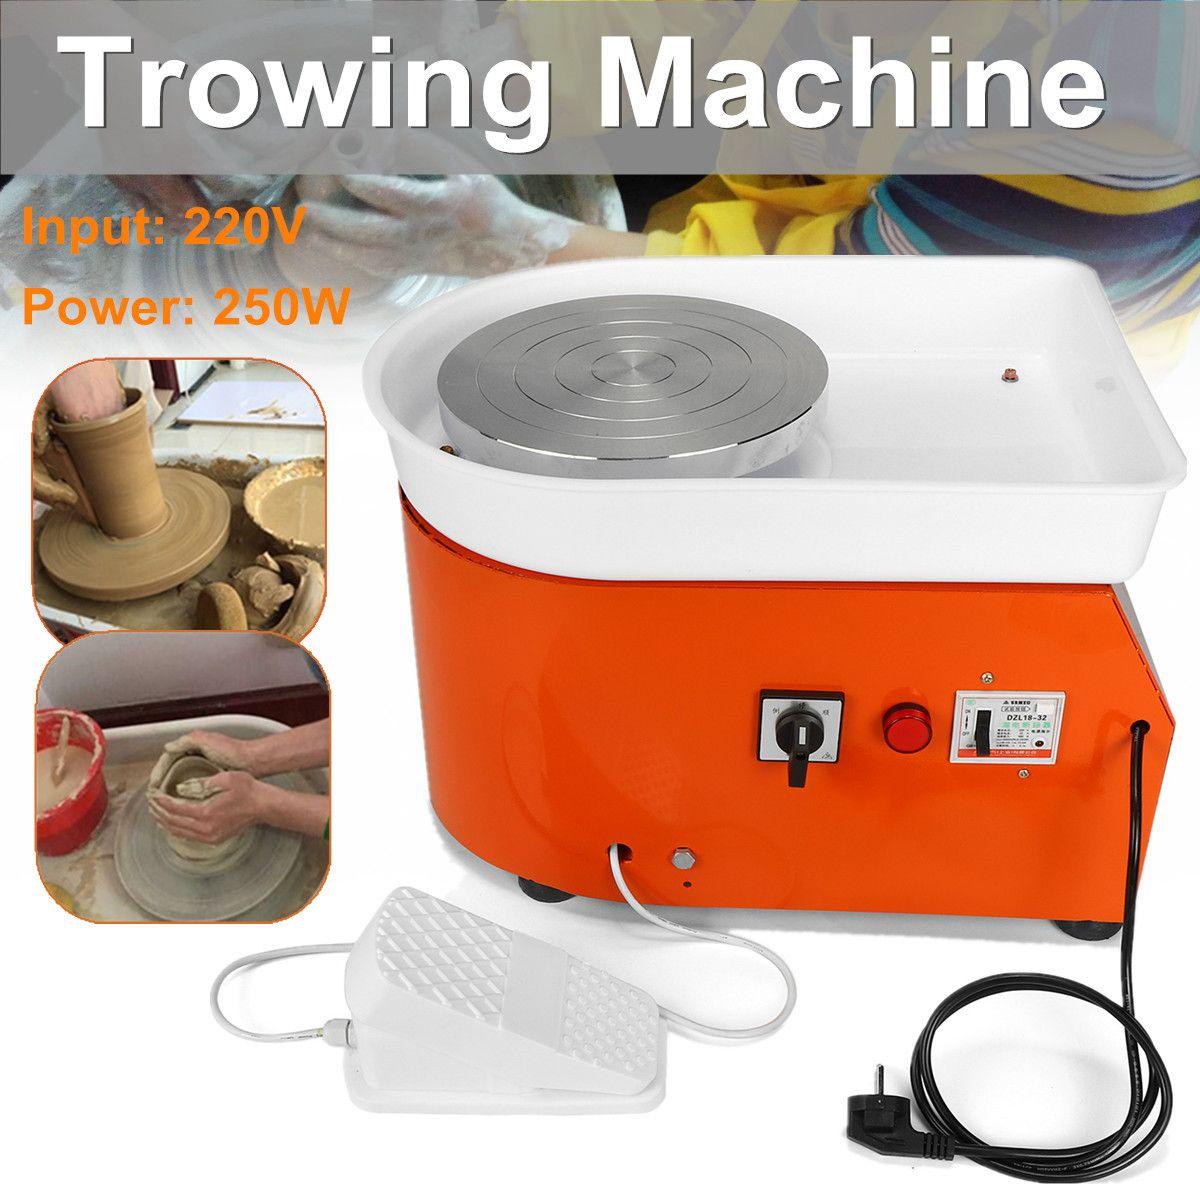 25cm Pottery Wheel Machine EU/AU AC220V 250-350W Ceramic Work Ceramics Clay Art With Mobile Flexible Foot Pedal Smooth Low Noise